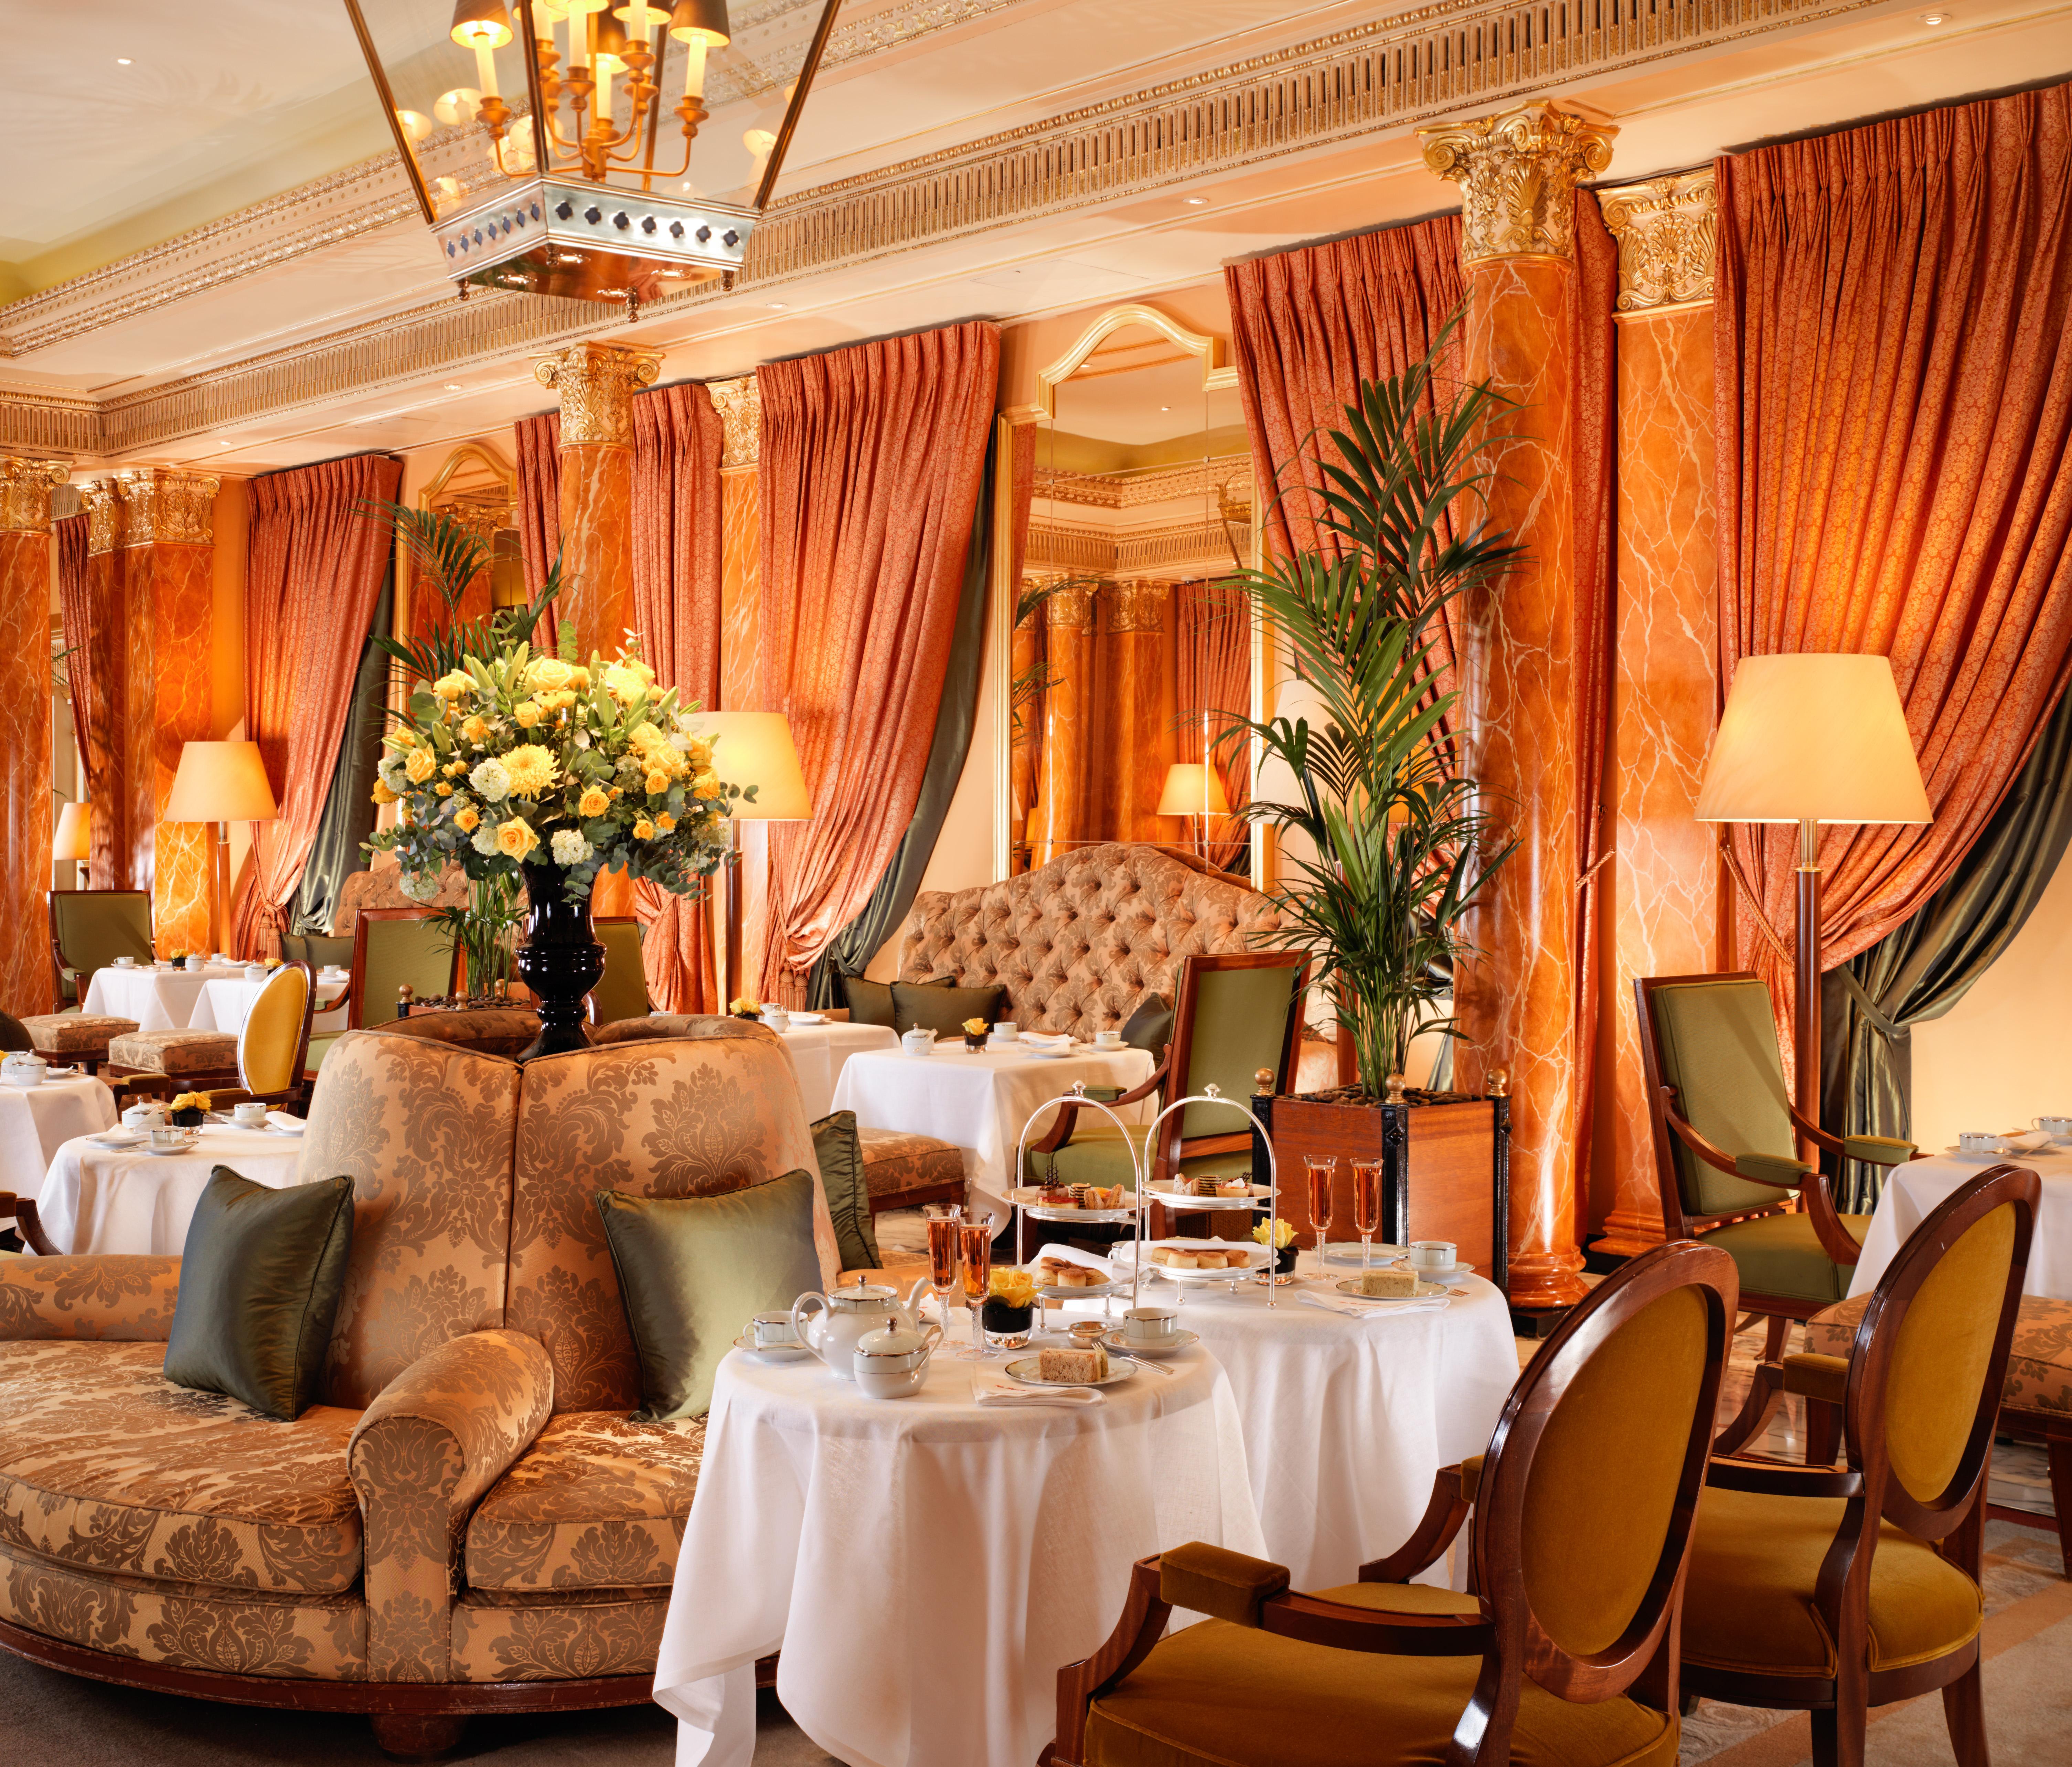 ISOB Hotel Room